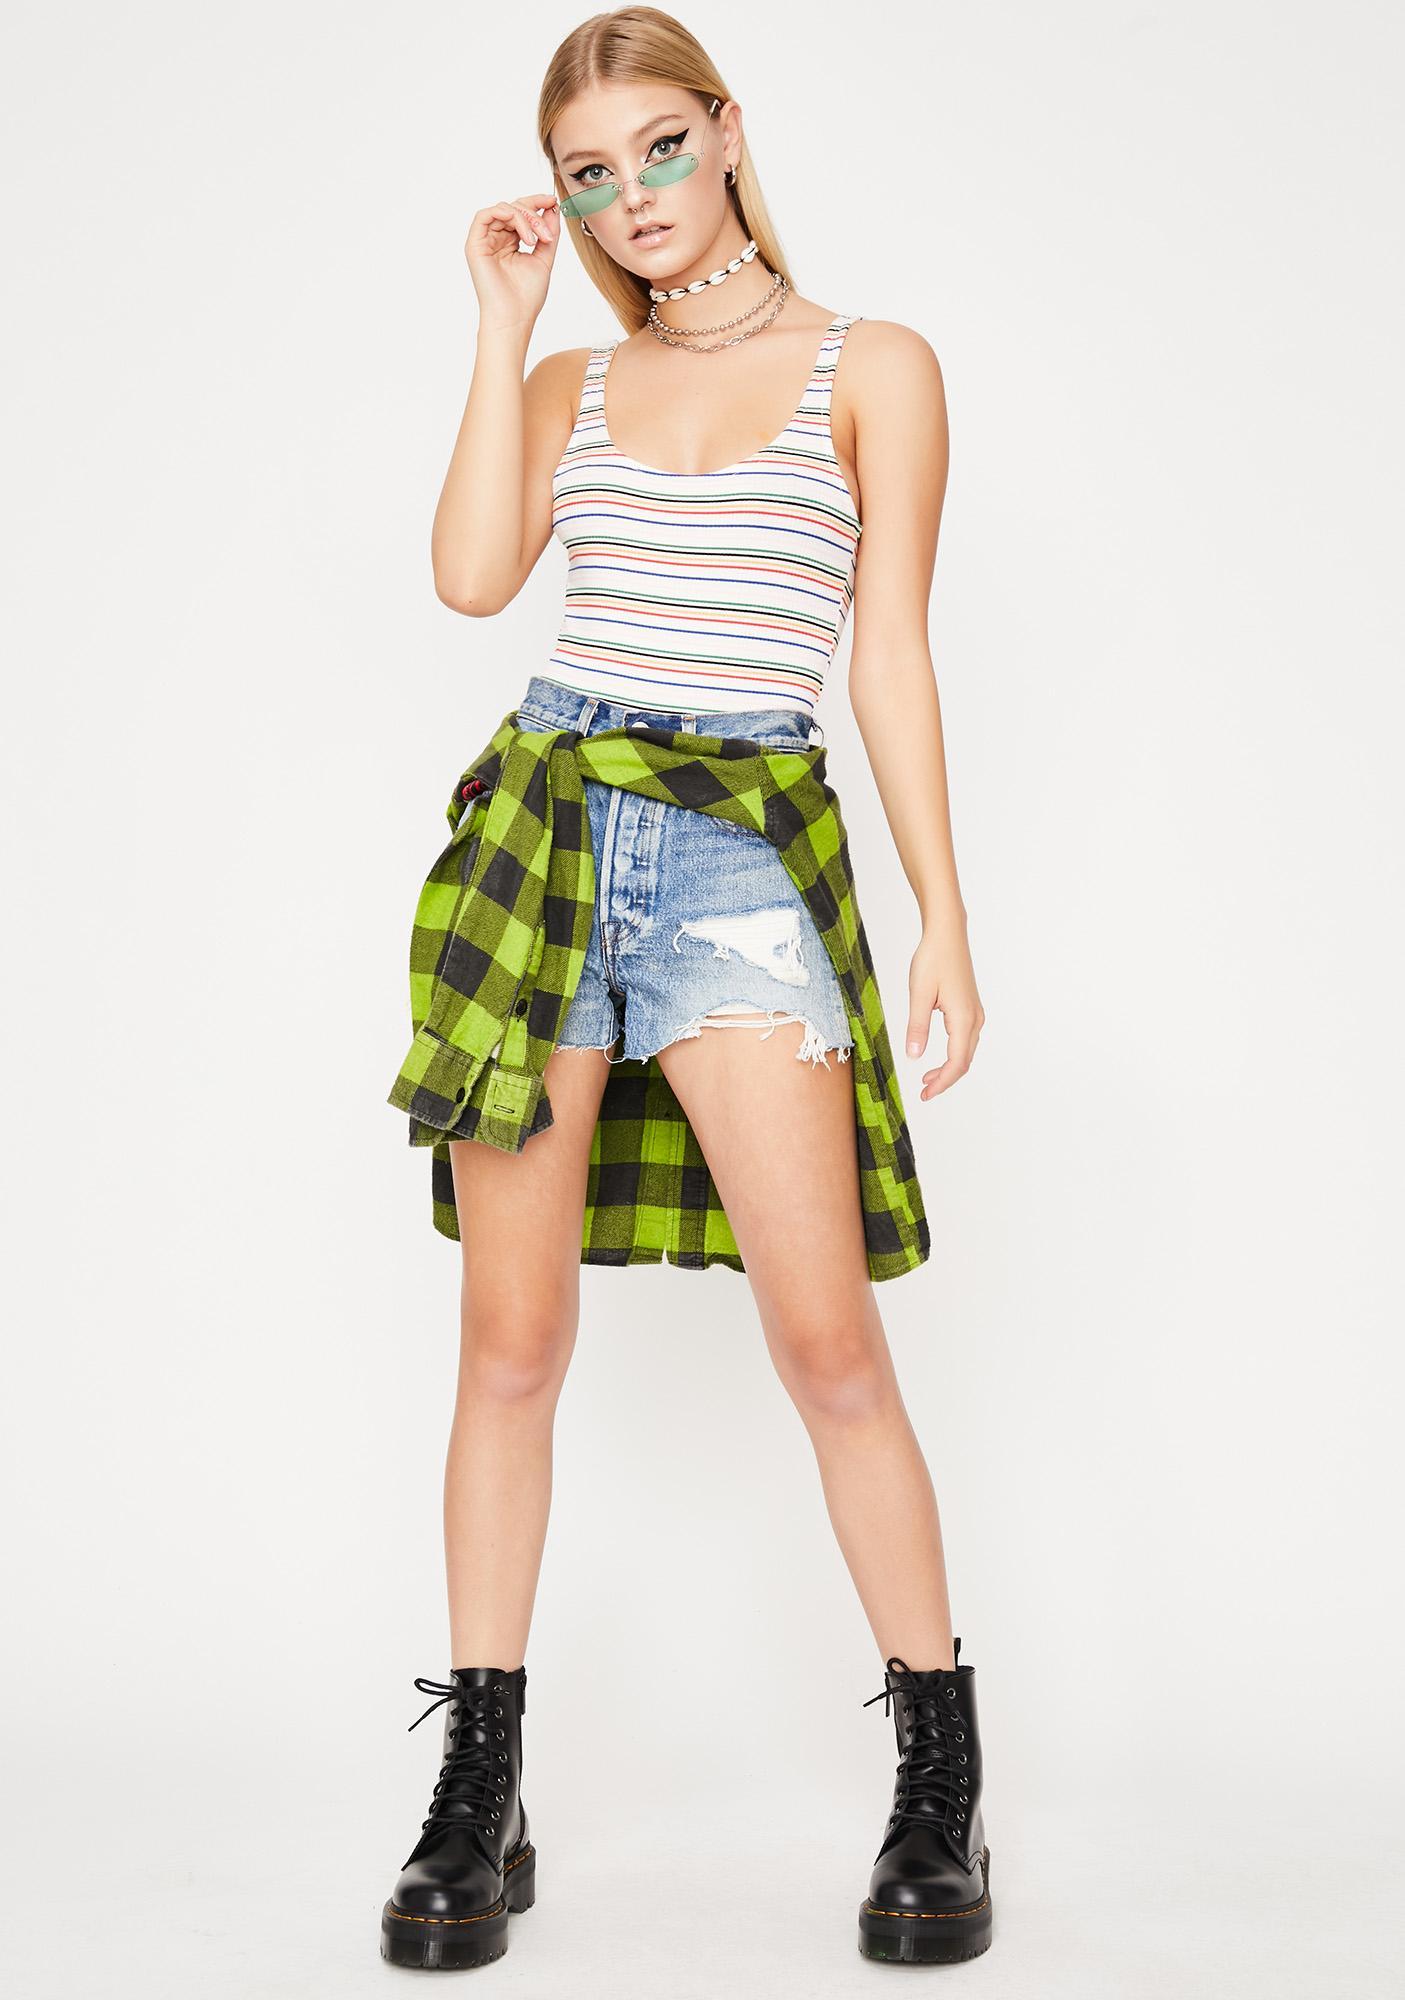 Festi Ready Striped Bodysuit